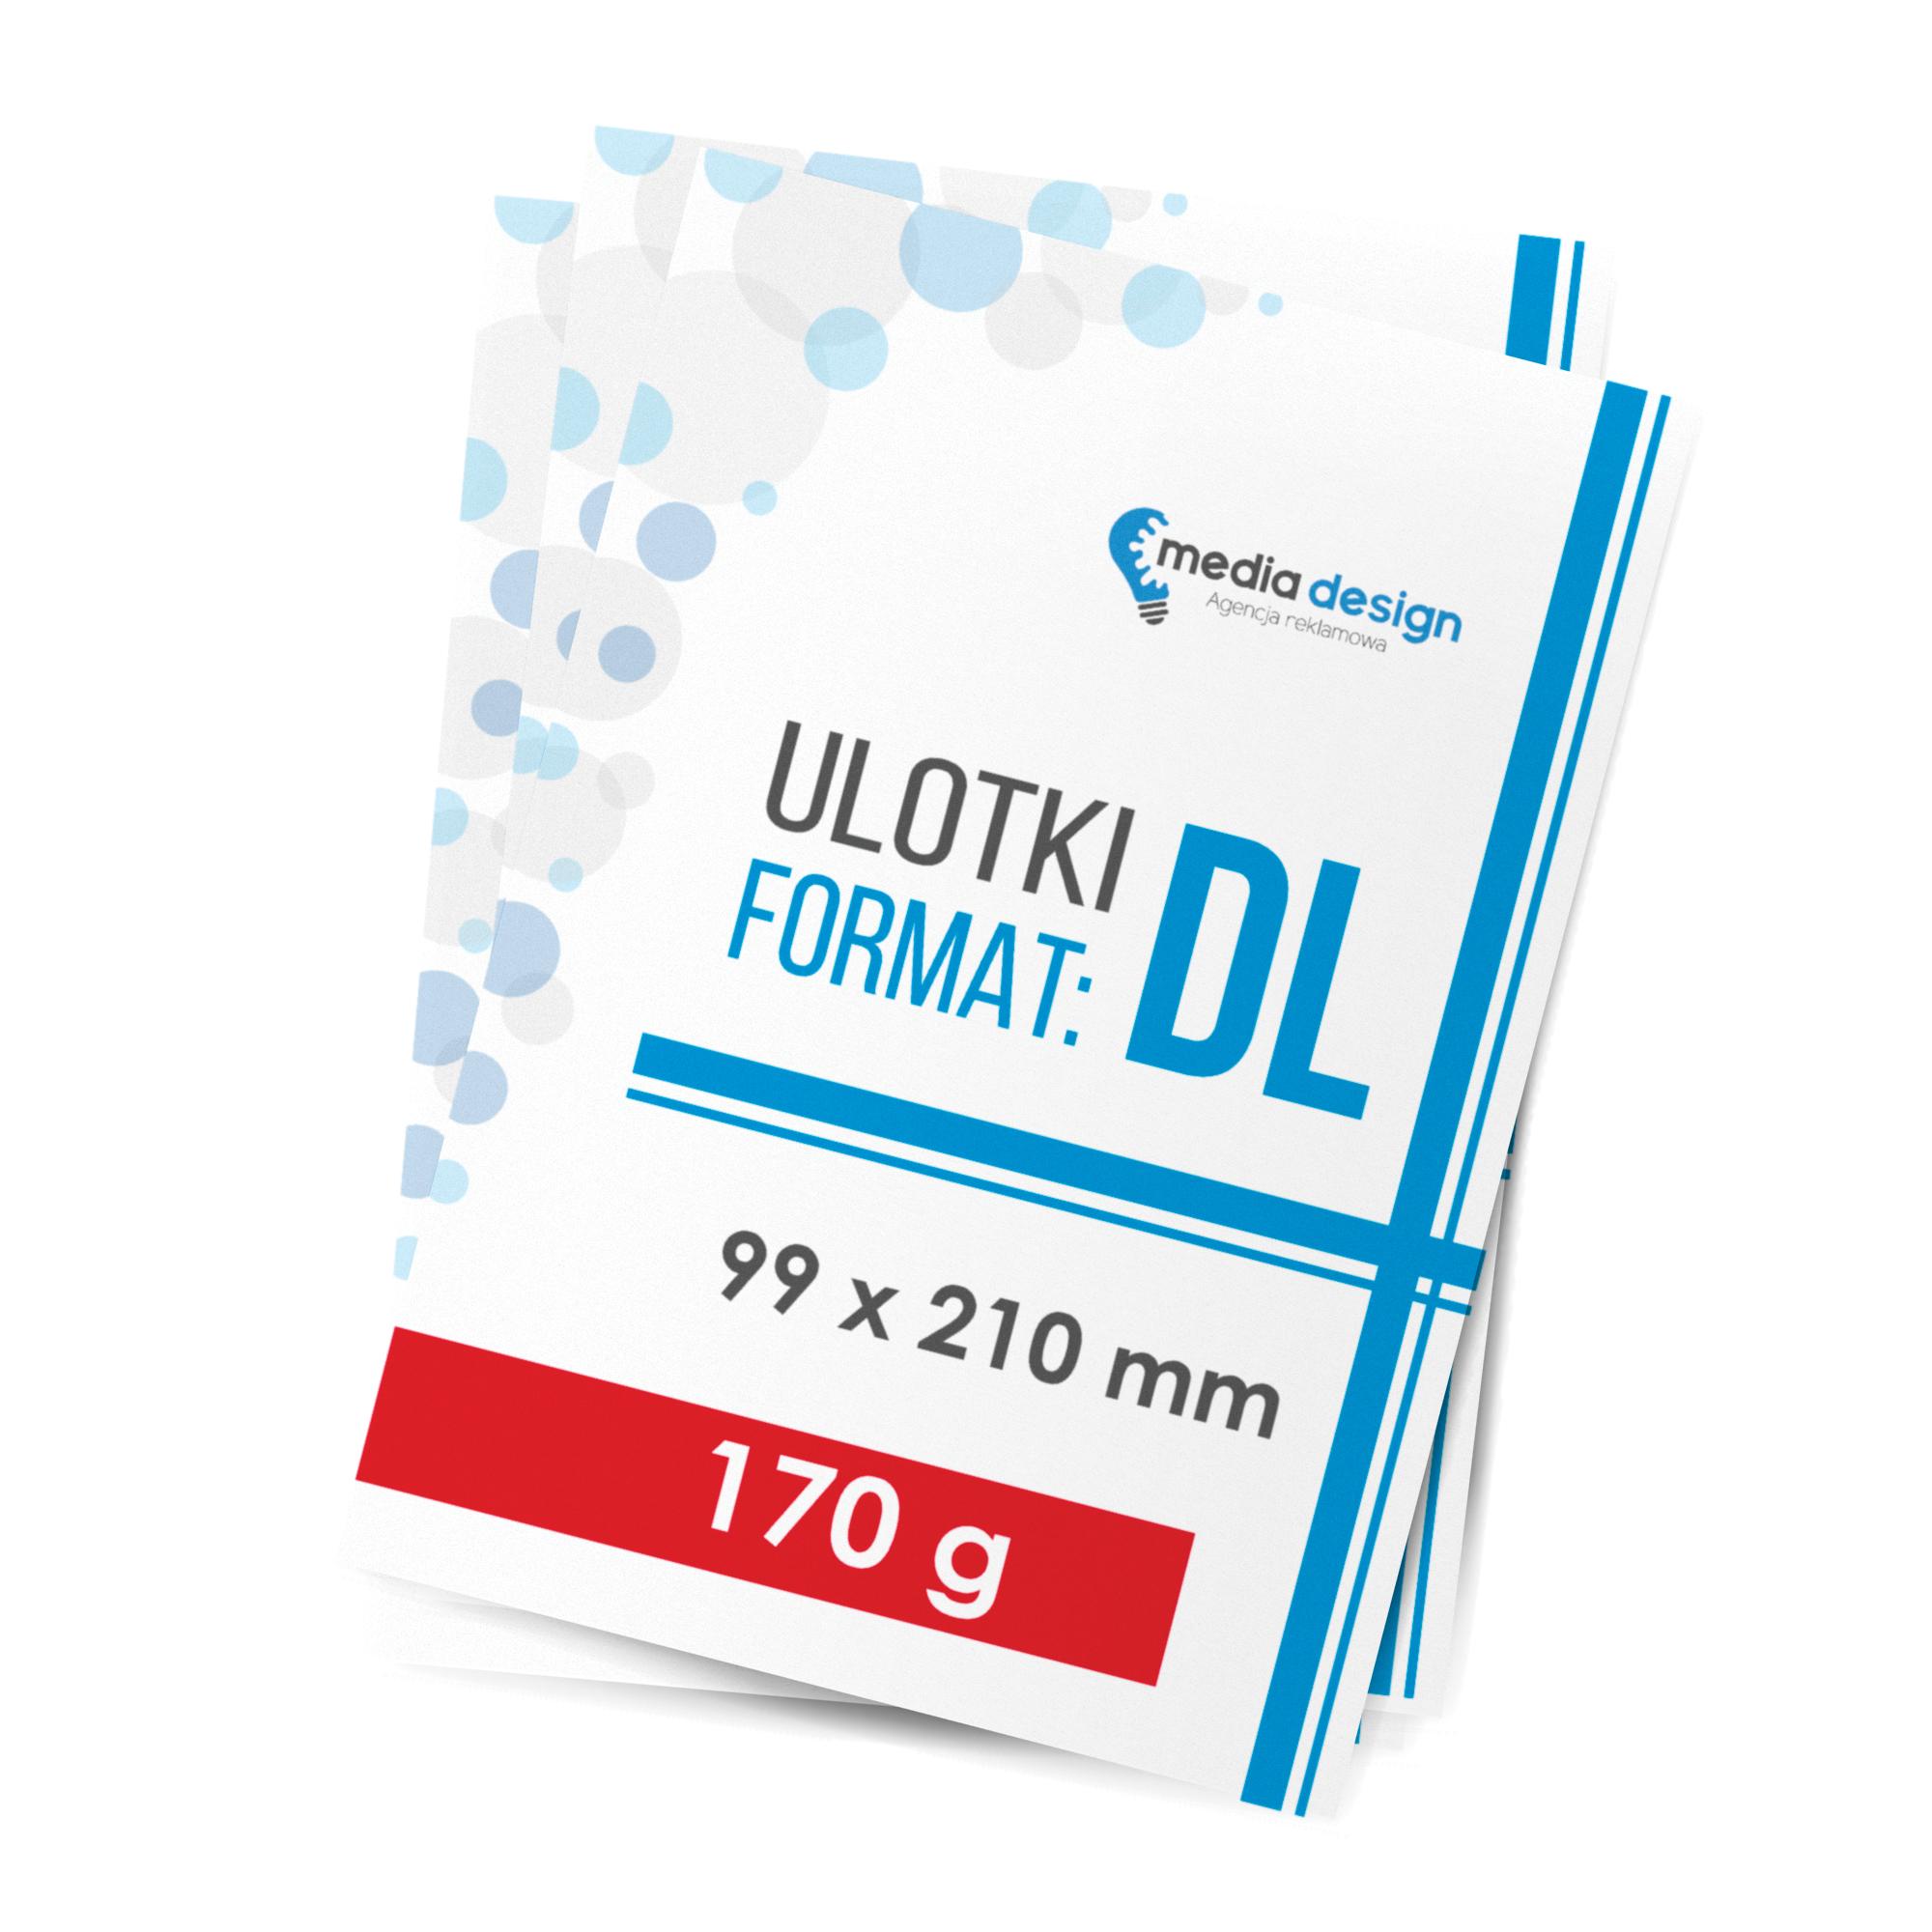 Ulotki DL (99x210mm) 170g